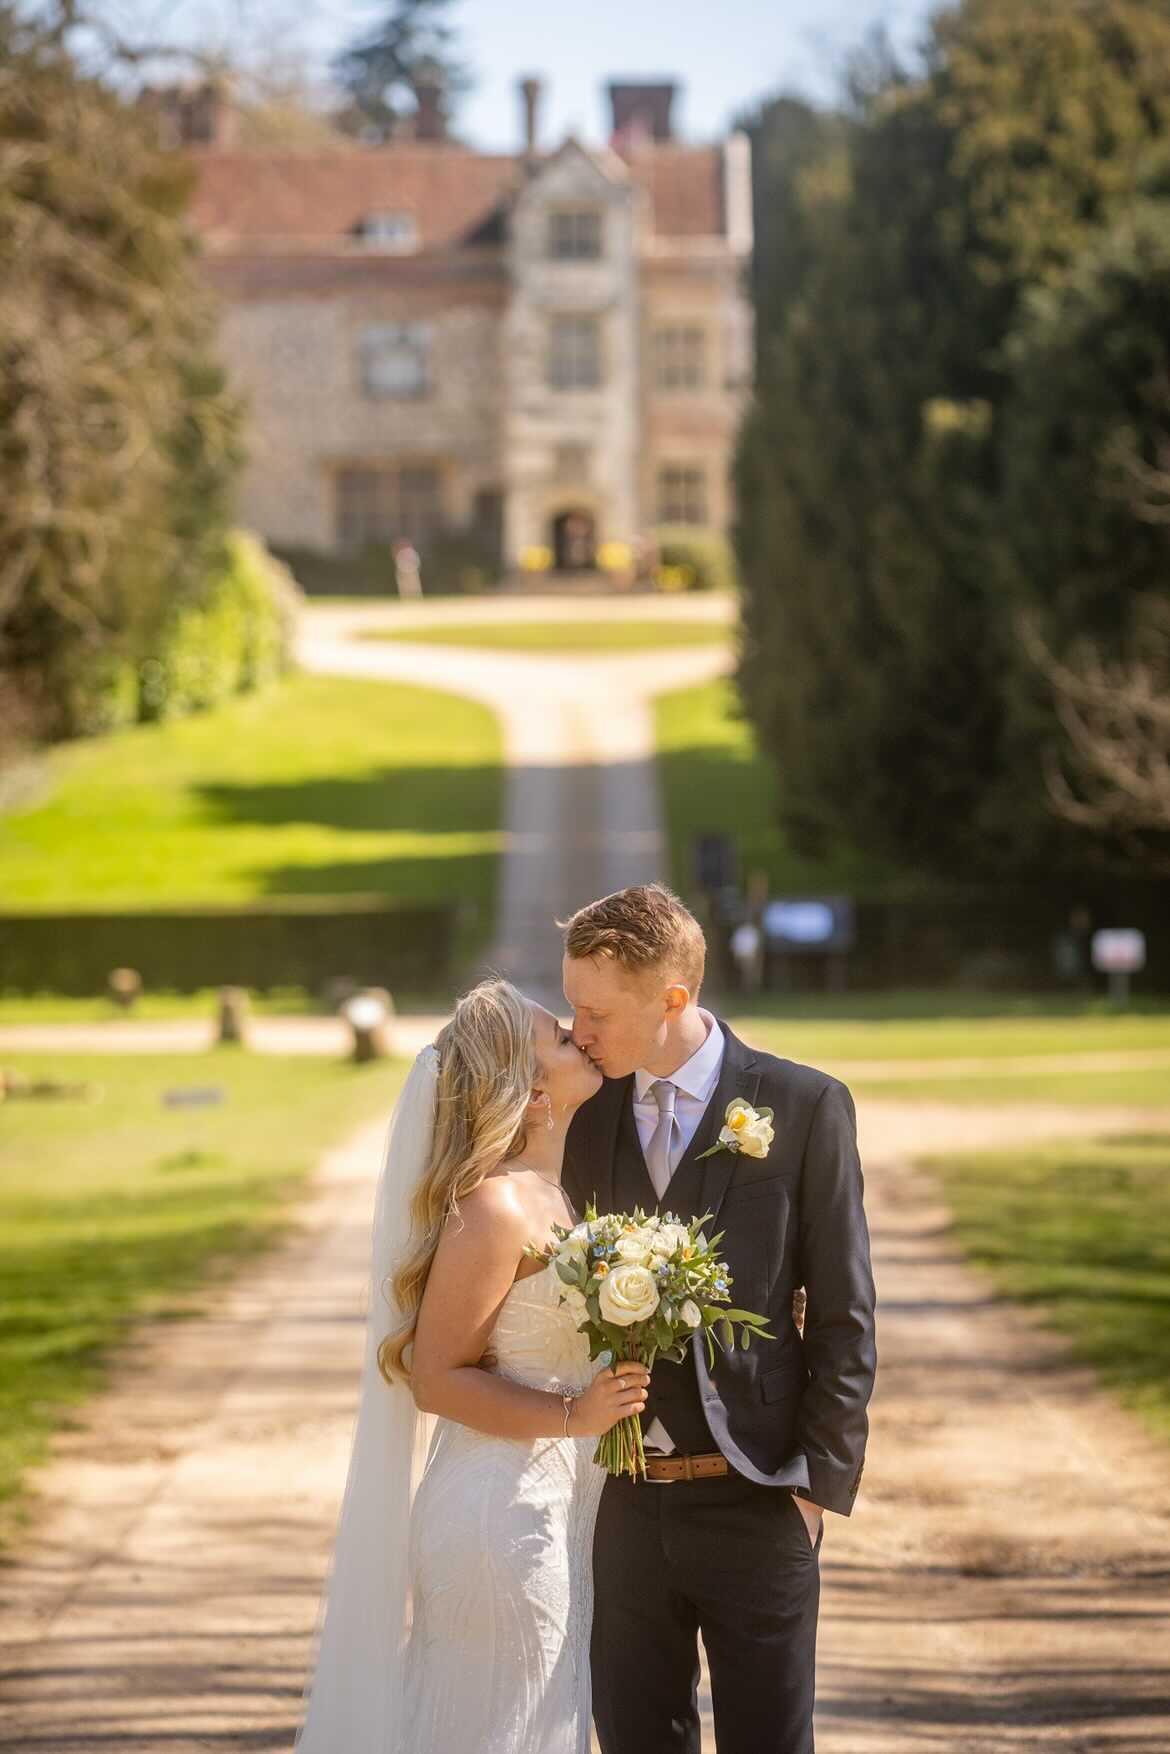 Jessica & Jonny Post Covid-19 Wedding